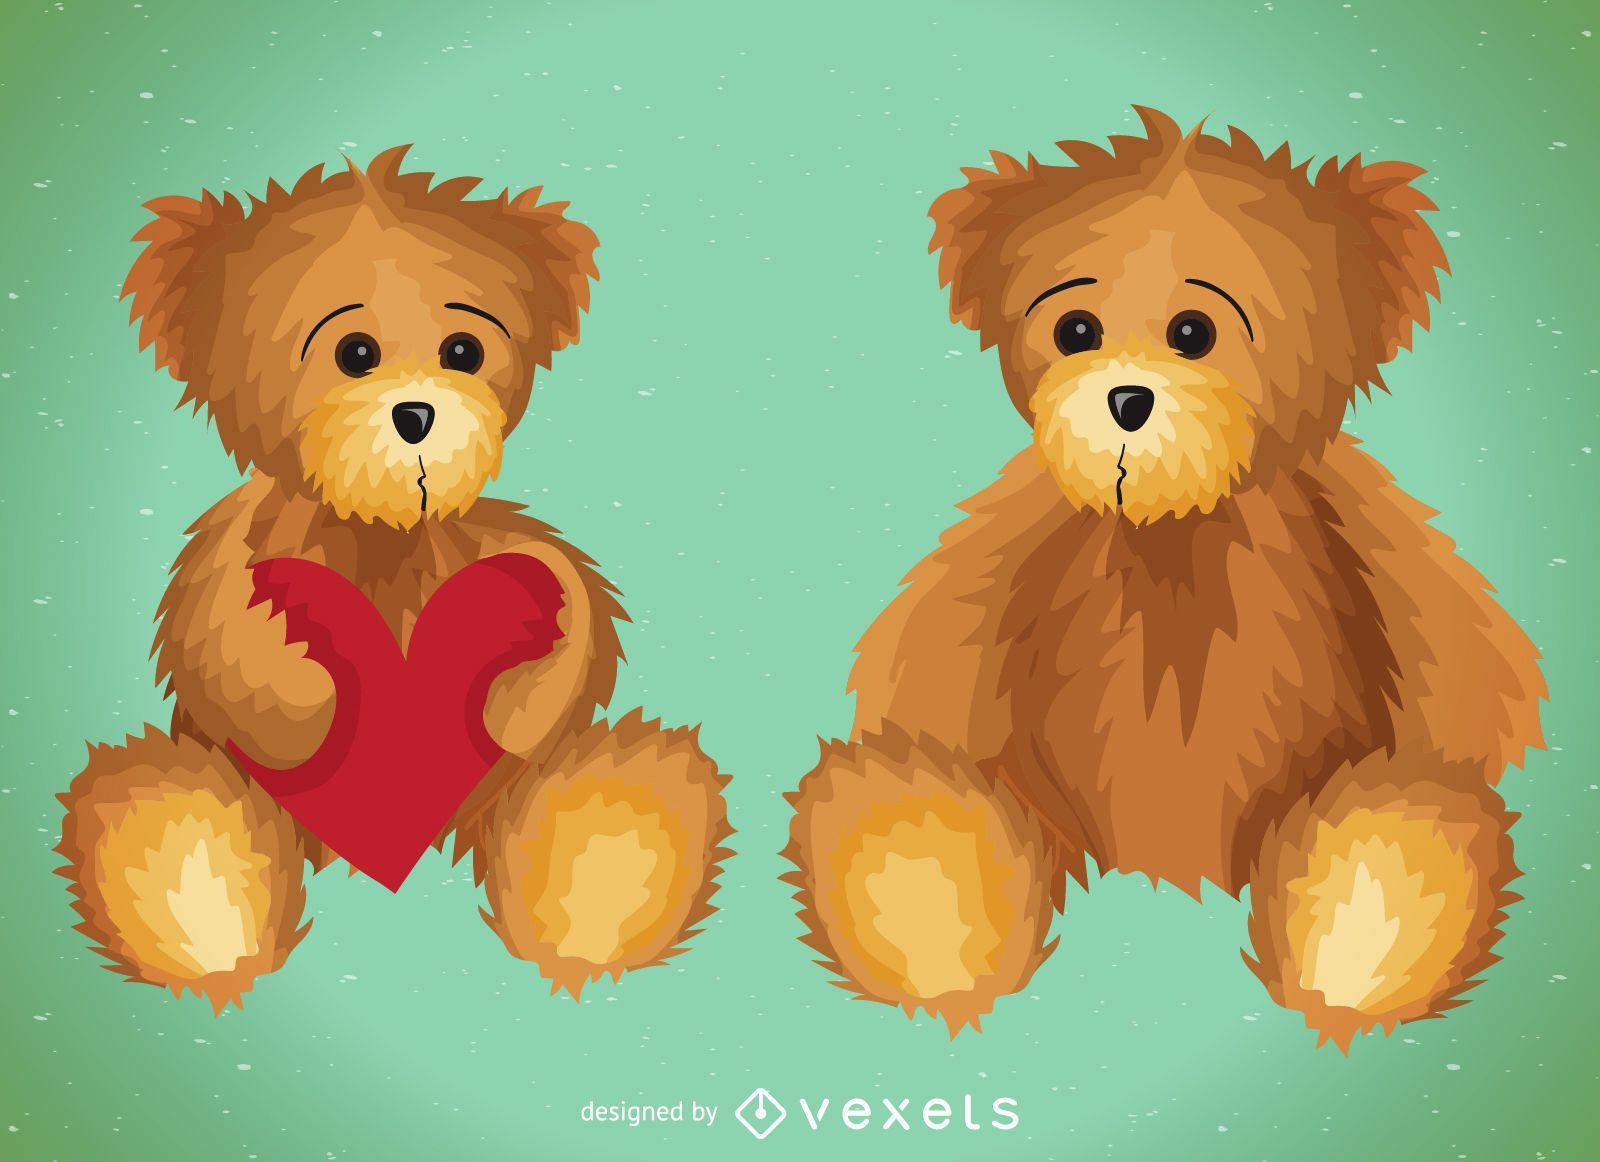 Teddy bear illustration set